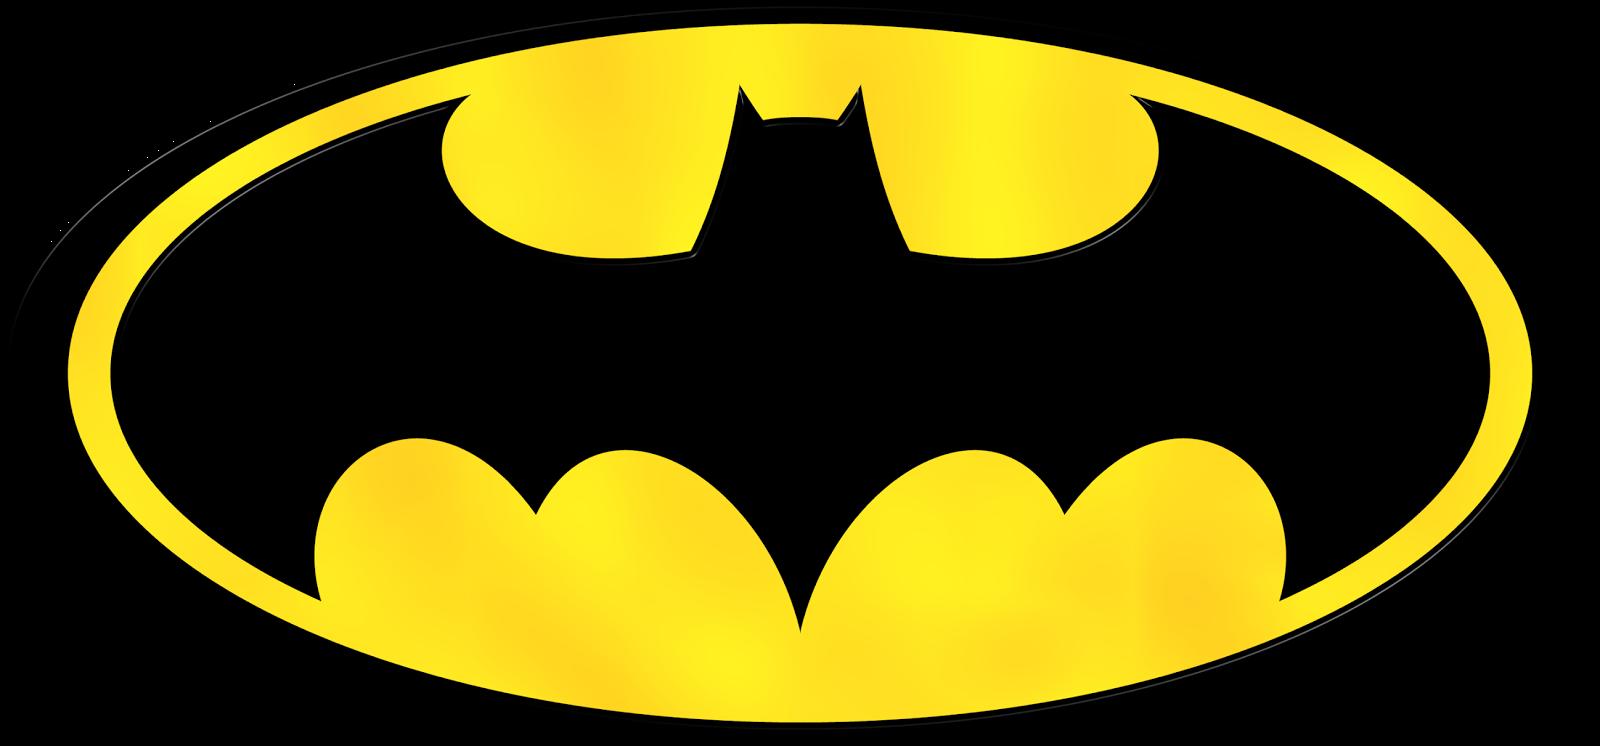 batman face clipart